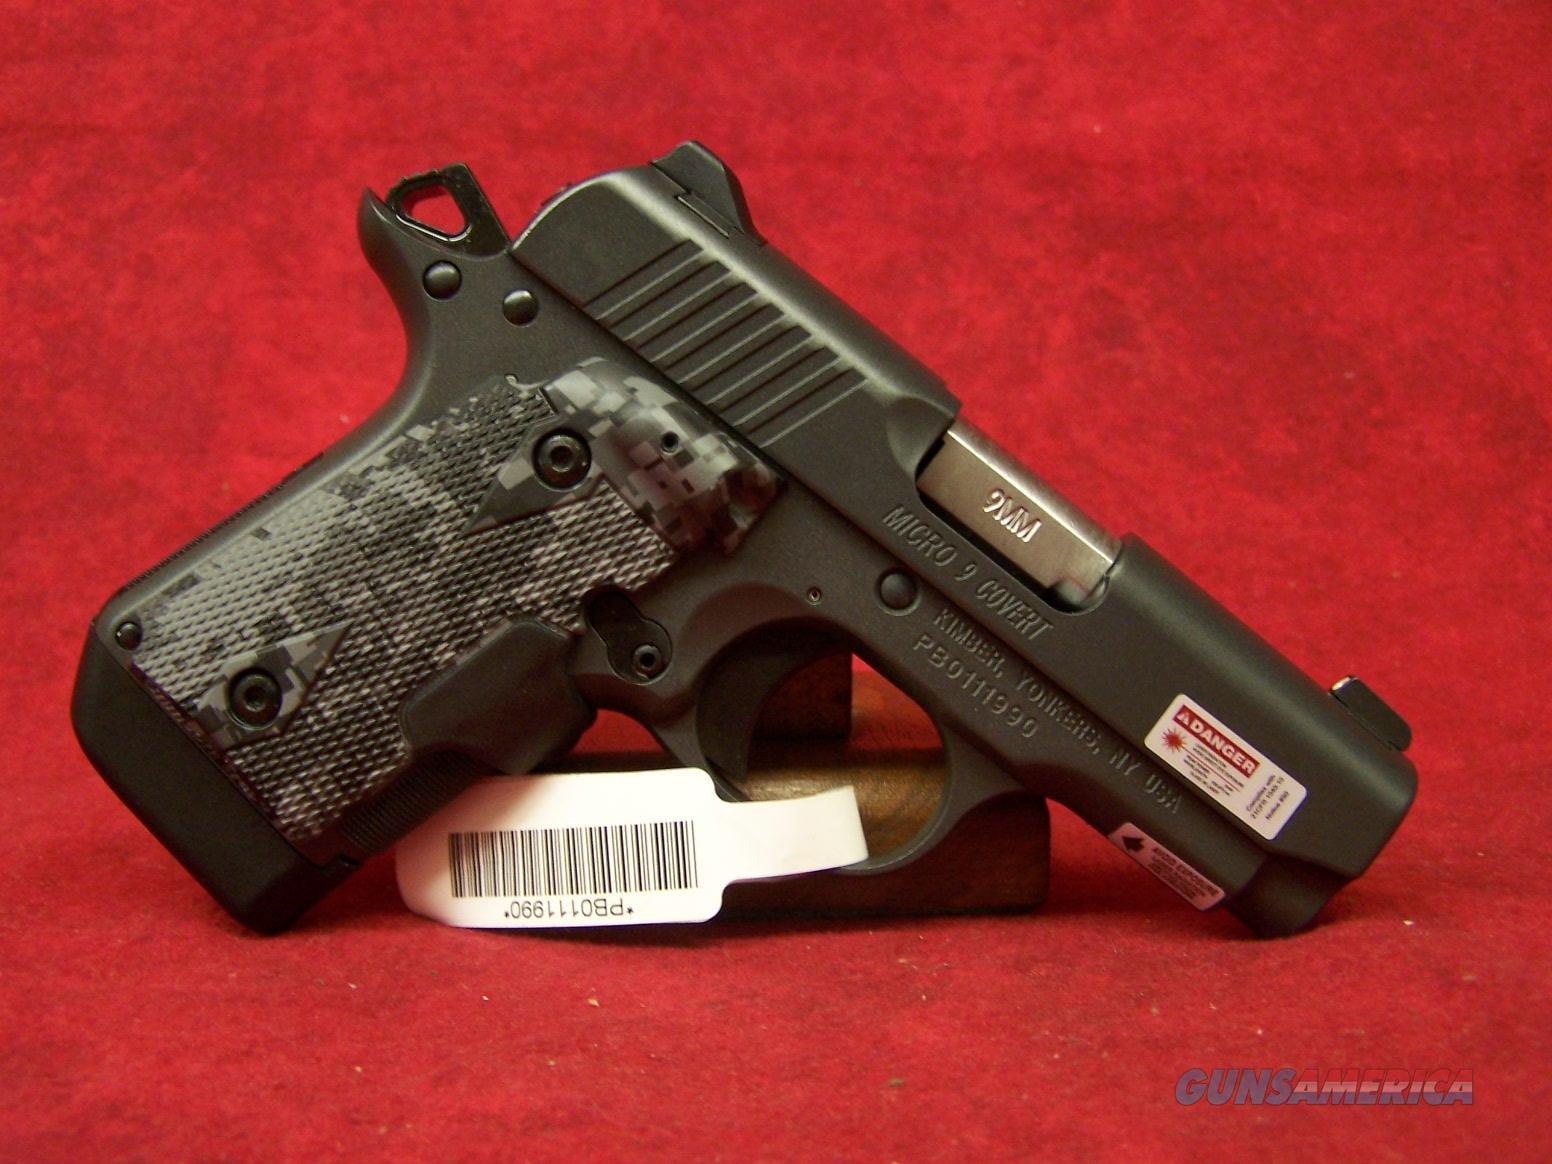 Kimber Micro 9 Covert 9mm laser grip and Night sights (33187)  Guns > Pistols > Kimber of America Pistols > Micro 9